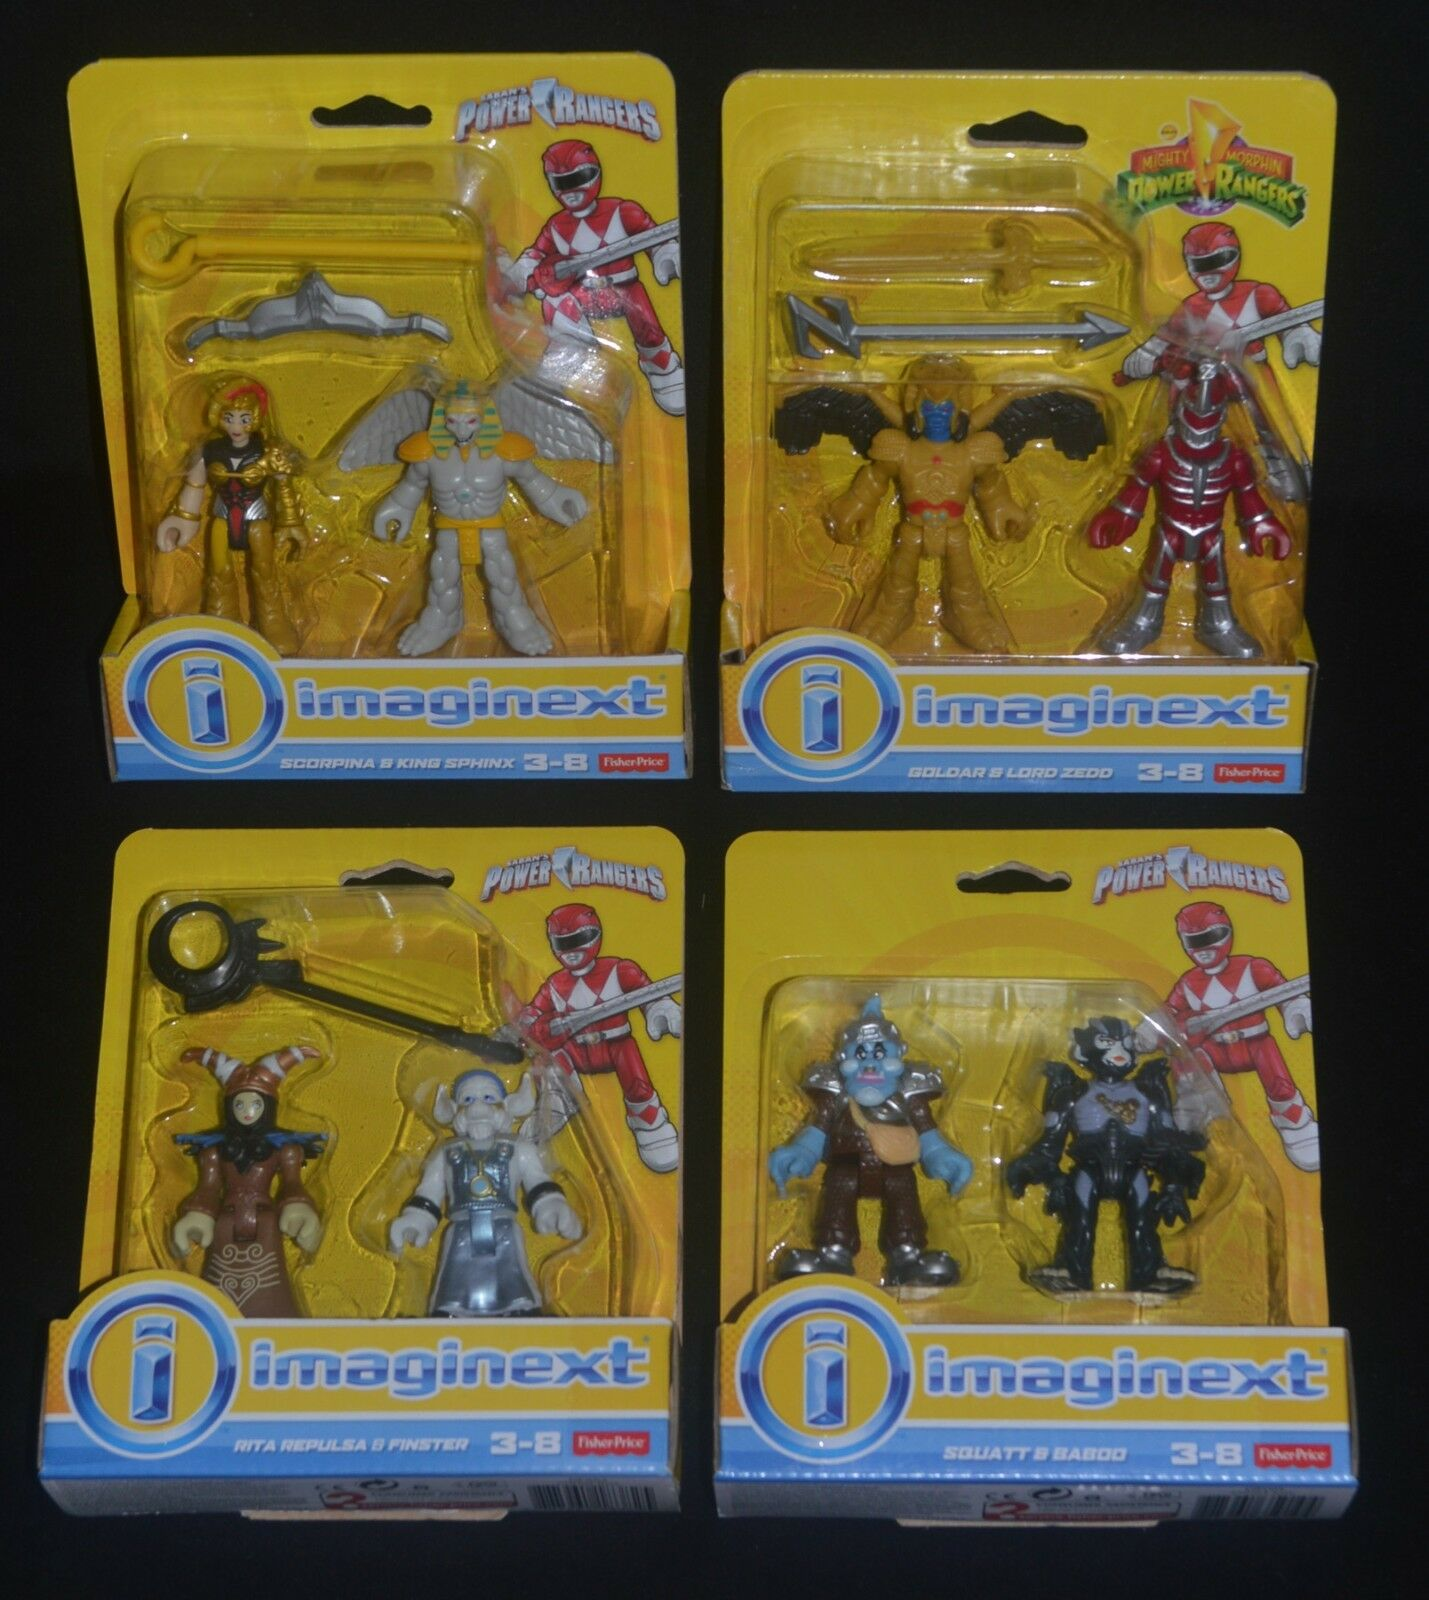 Power Rangers Rangers Rangers Large goldAR & RITA REPULSA, SCORPINA & KING SPHINX & 3 Other Sets c131c6